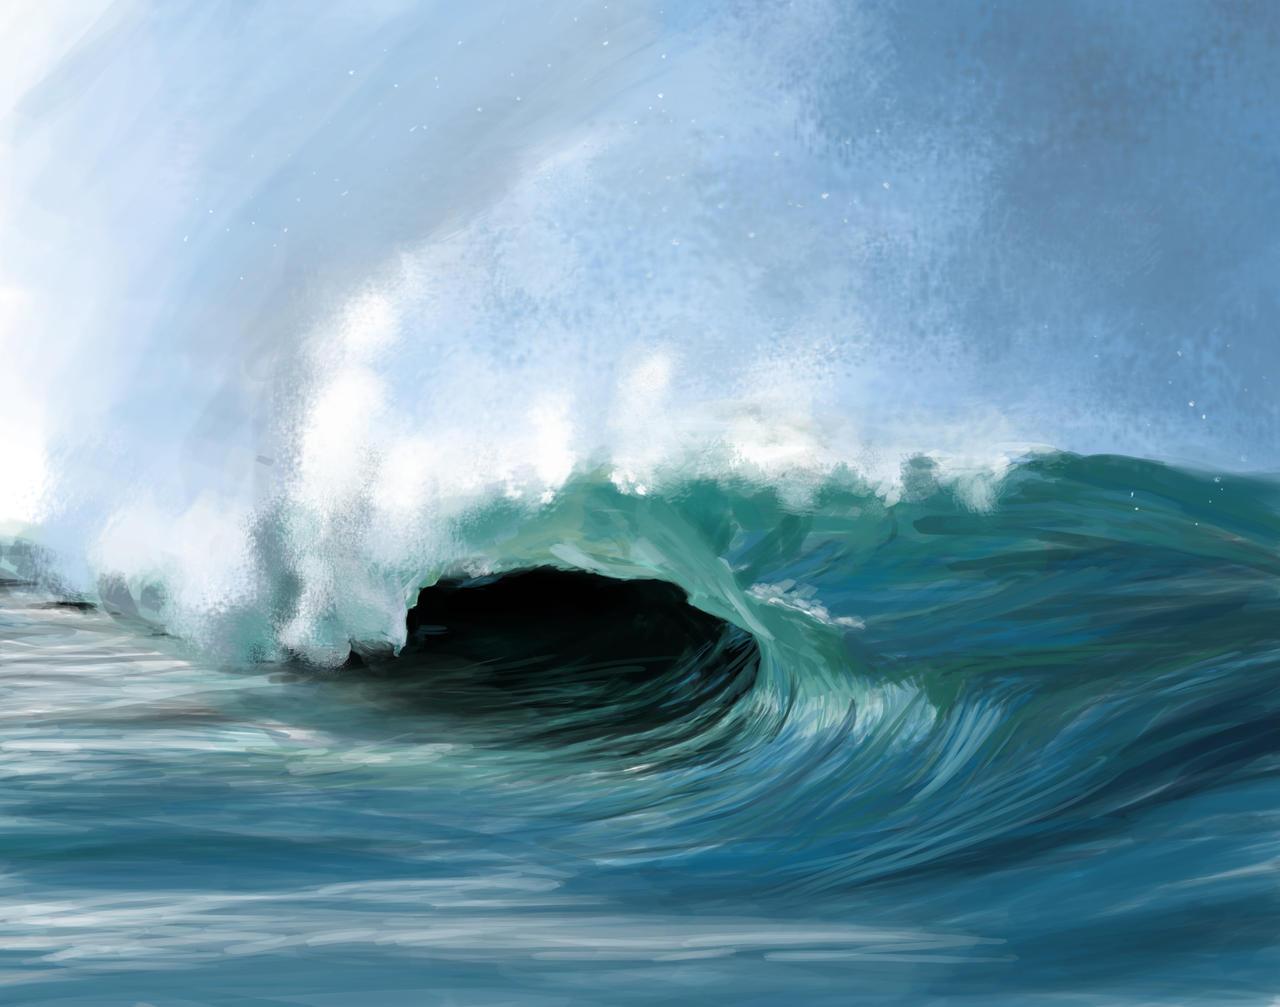 [Image: another_wave_by_tercelbg-d80jv9z.jpg]